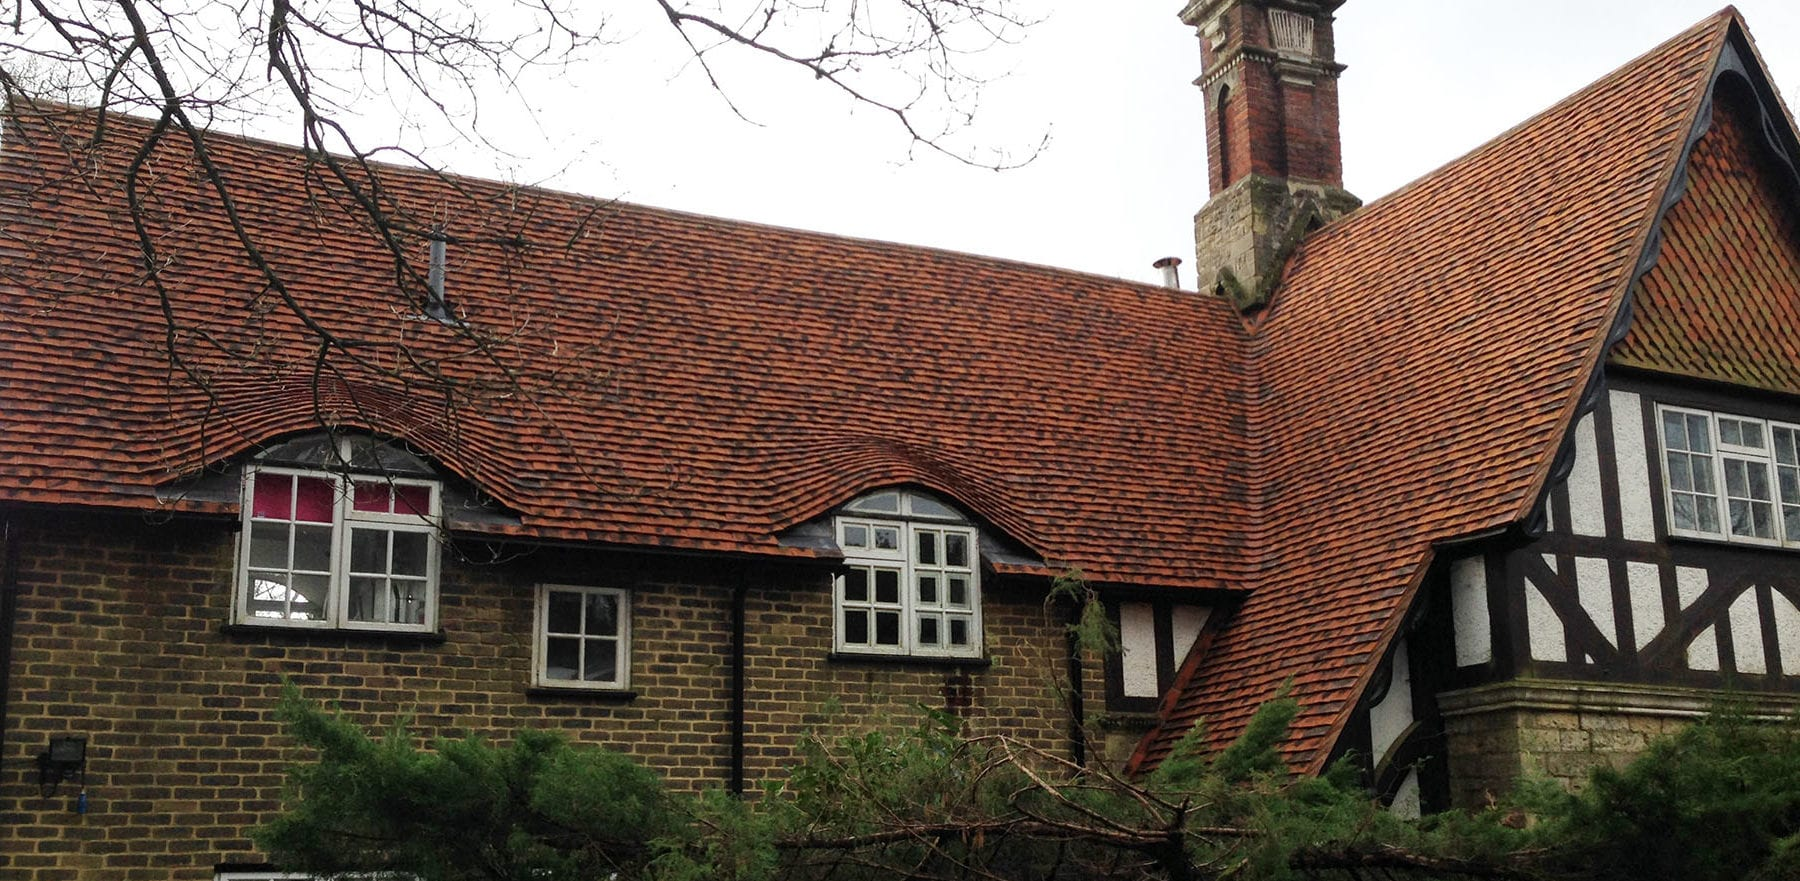 Lifestiles - Handmade Berkshire Clay Roof Tiles - Flimwell, England 4